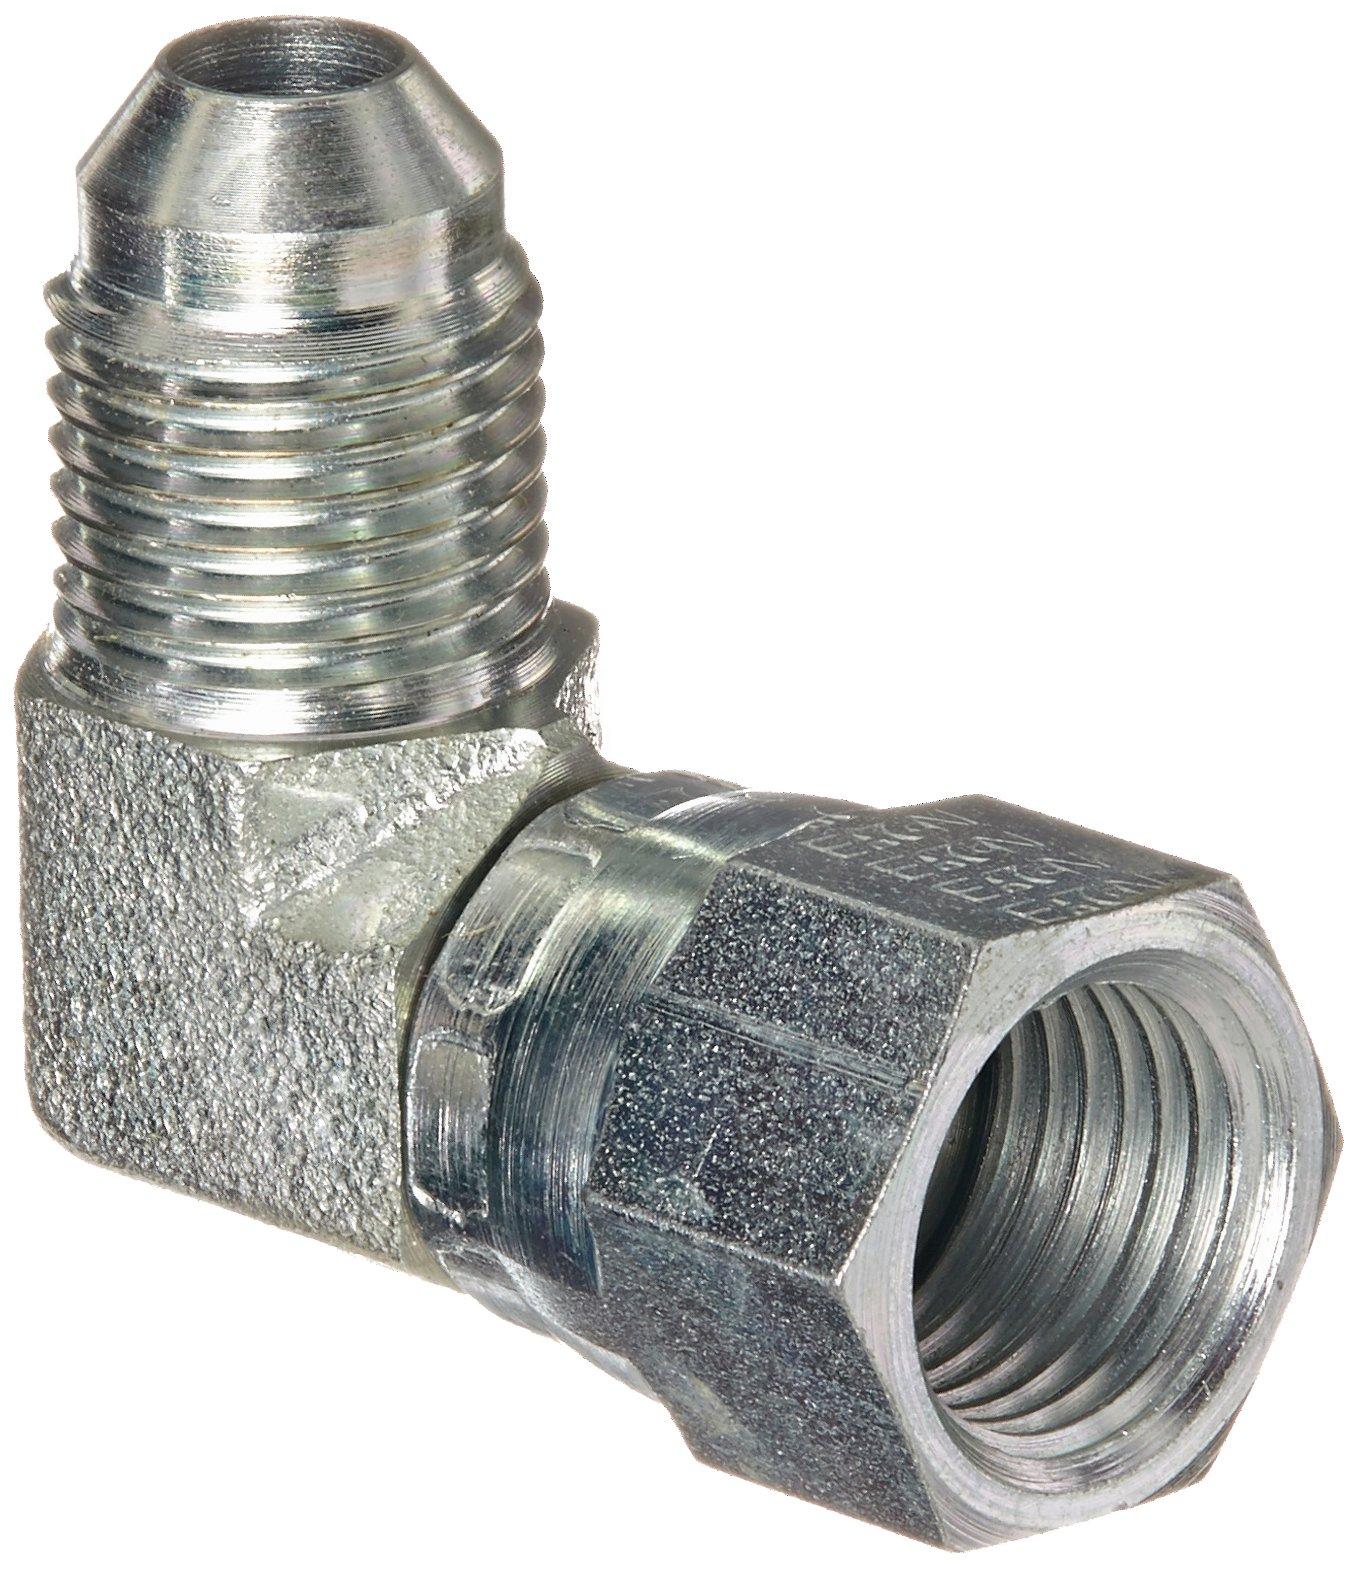 Eaton Aeroquip 2071-5-5S 90 Degree Swivel Nut Elbow, JIC 37 Degree End Types, Carbon Steel, 5/16 JIC(f) x 5/16 JIC(m) End Size, 5/16'' Tube OD